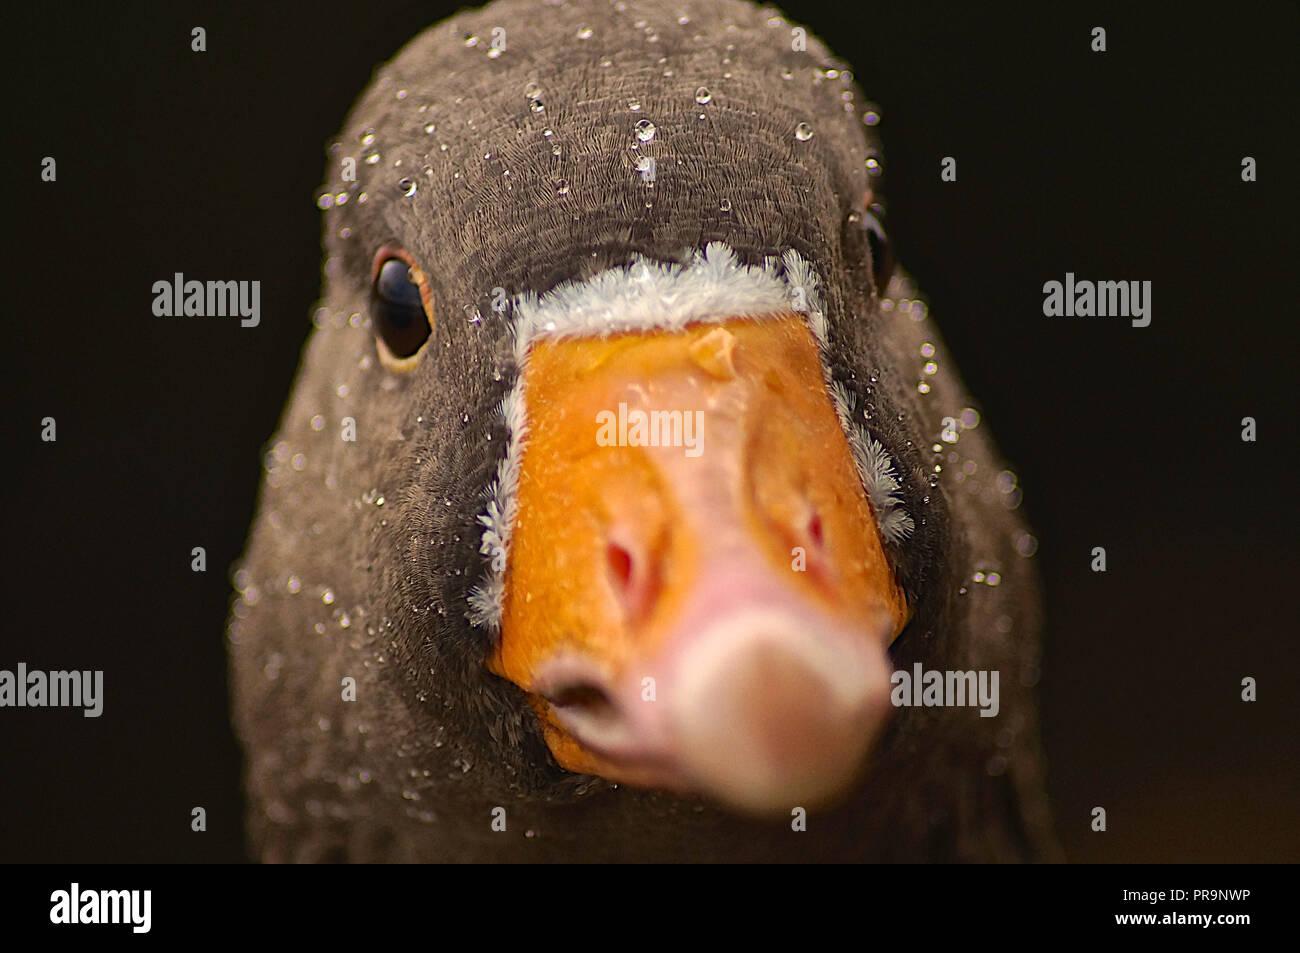 Greylag goose close up face - Stock Image